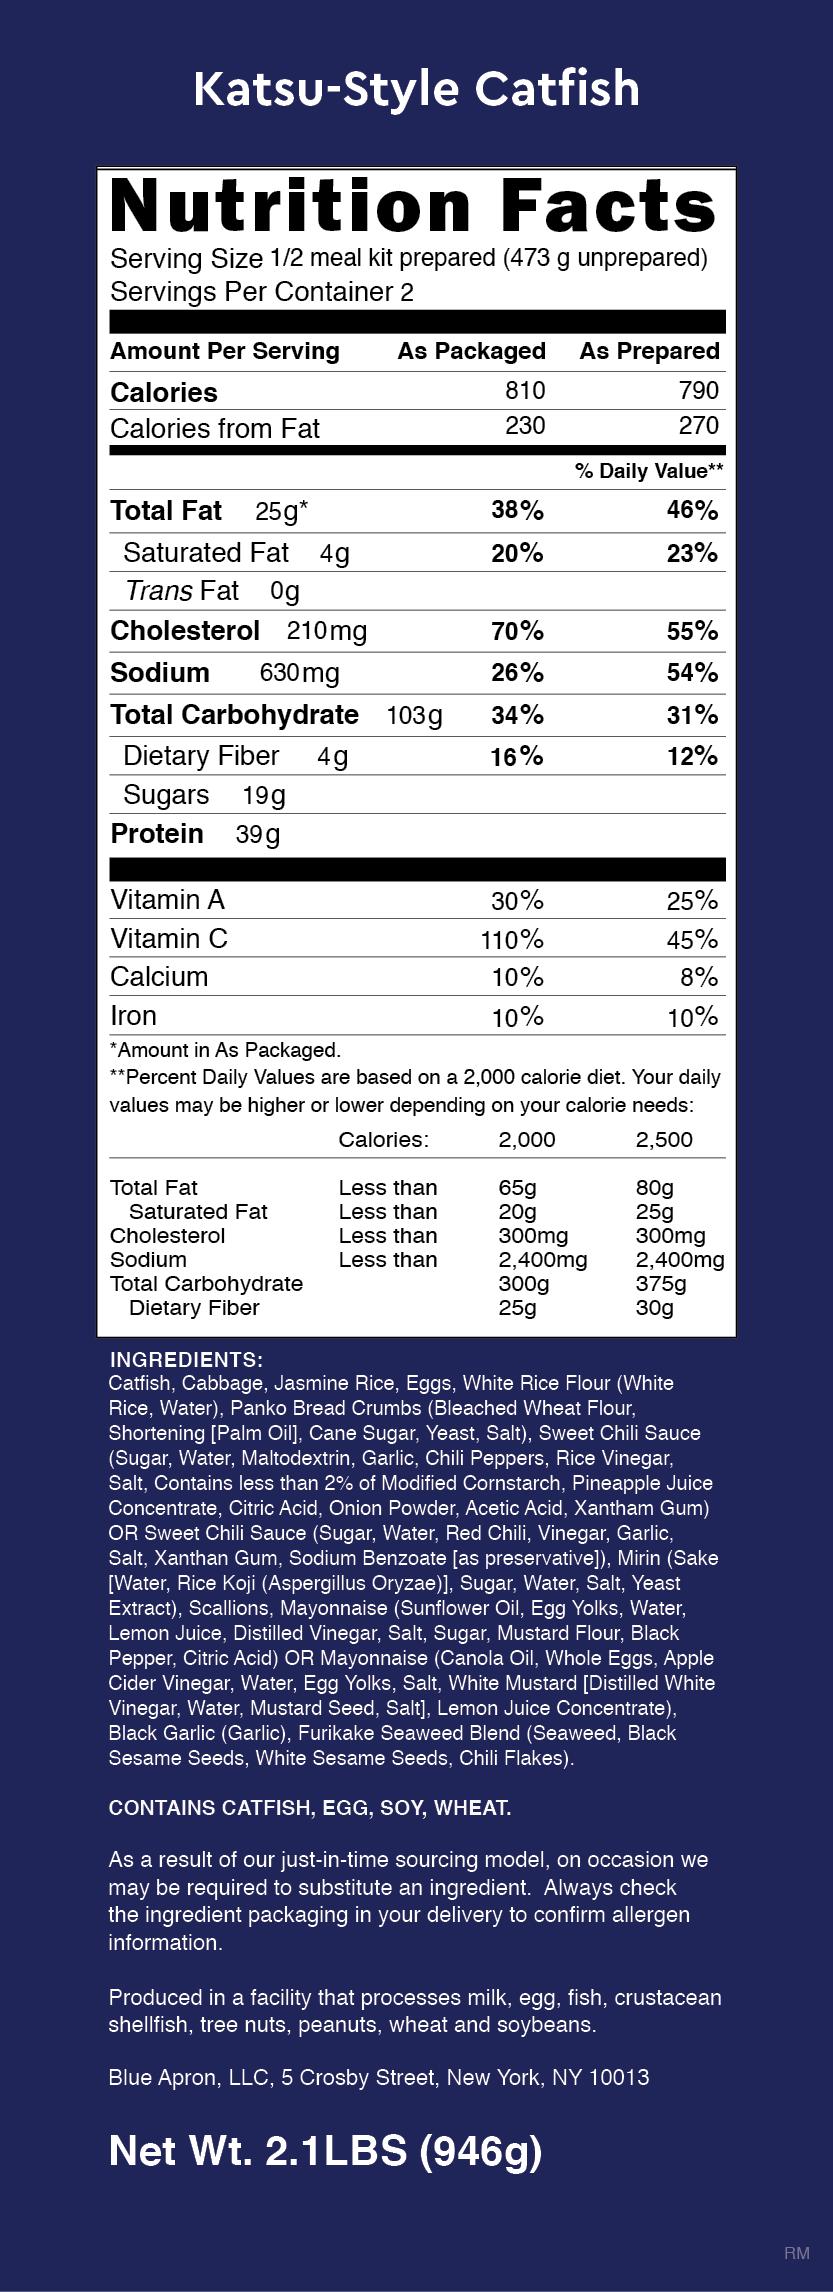 Blue apron katsu catfish - Nutrition Label